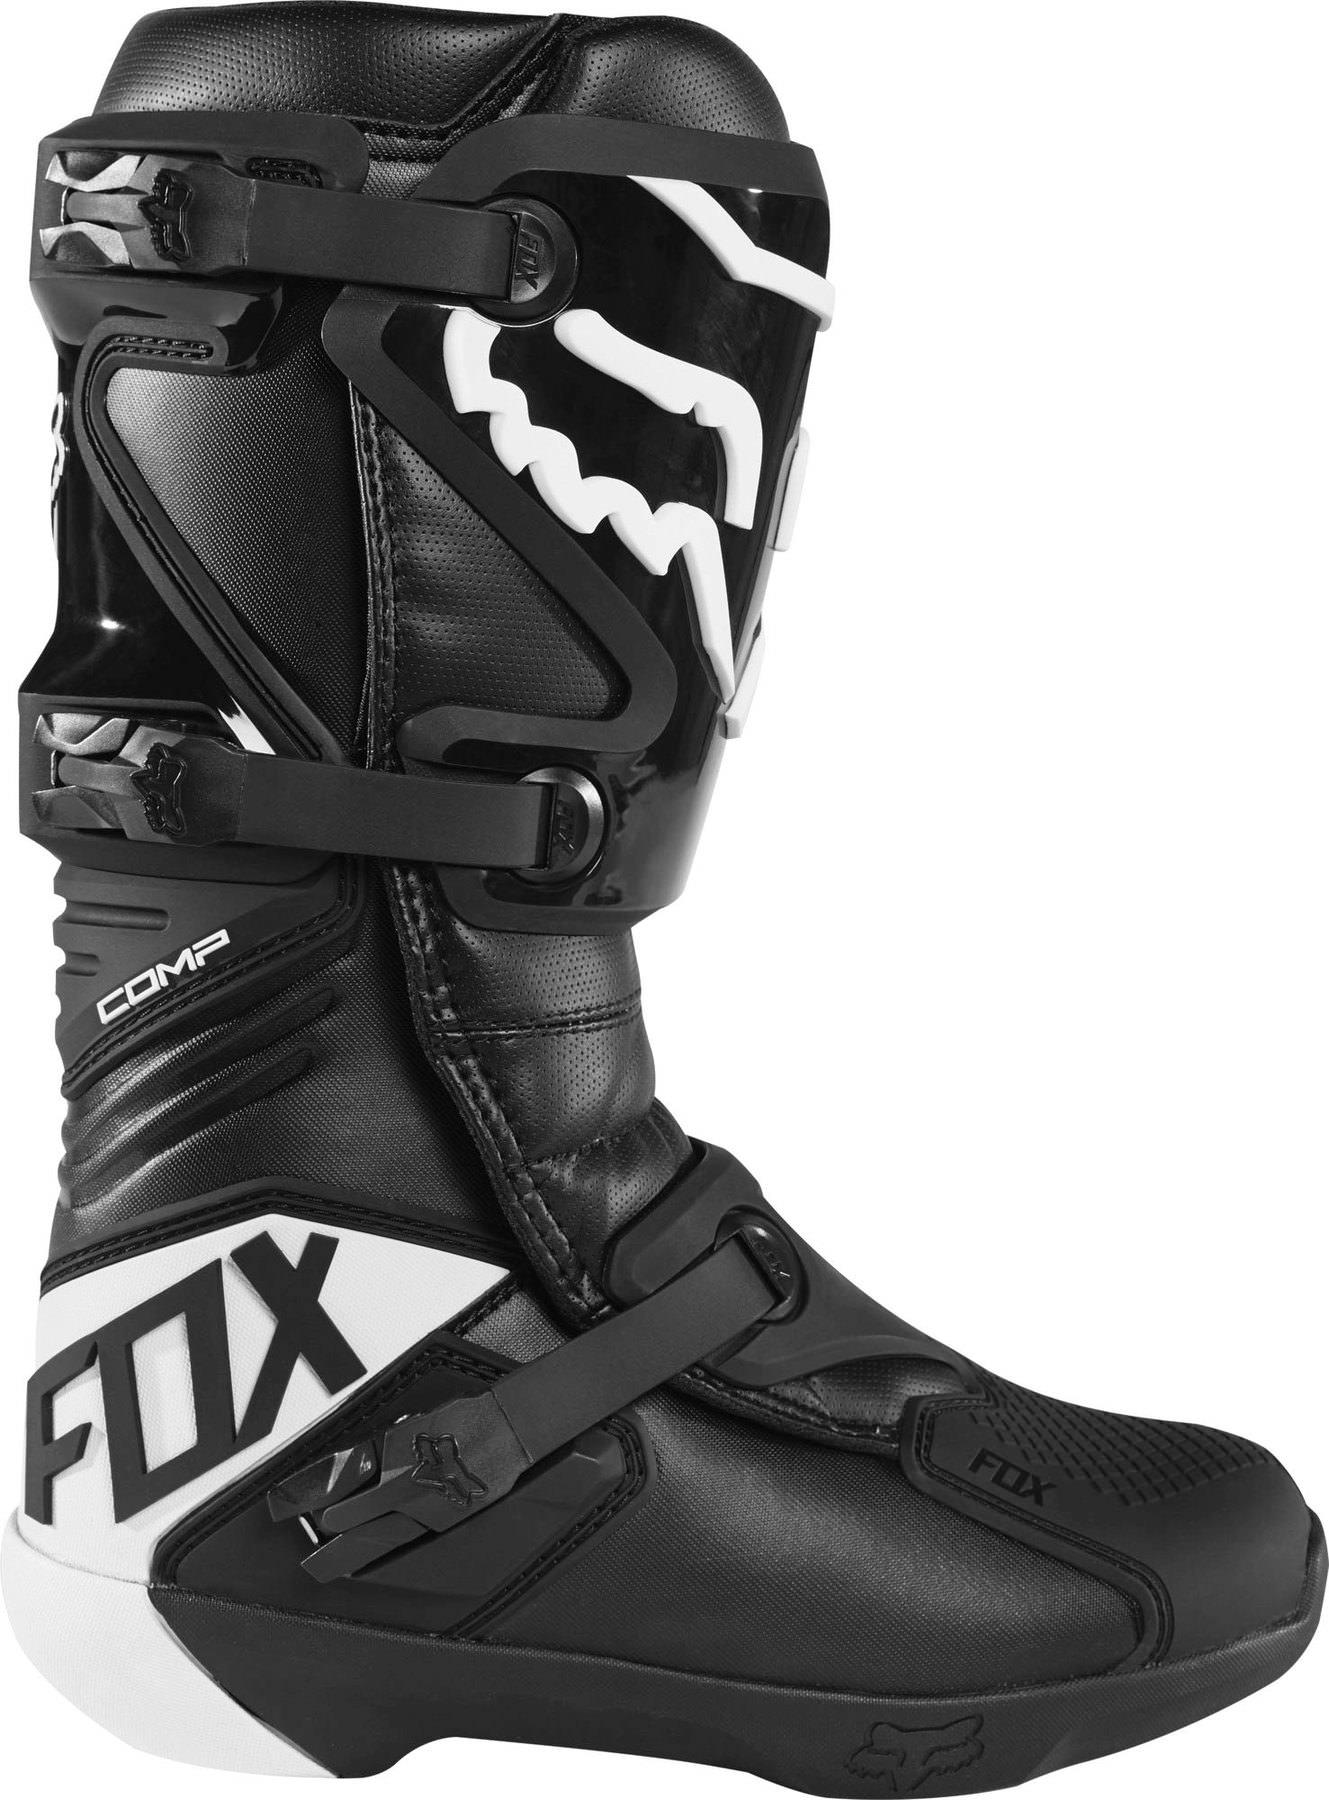 Buy Fox Crossboots Comp Boots   Louis